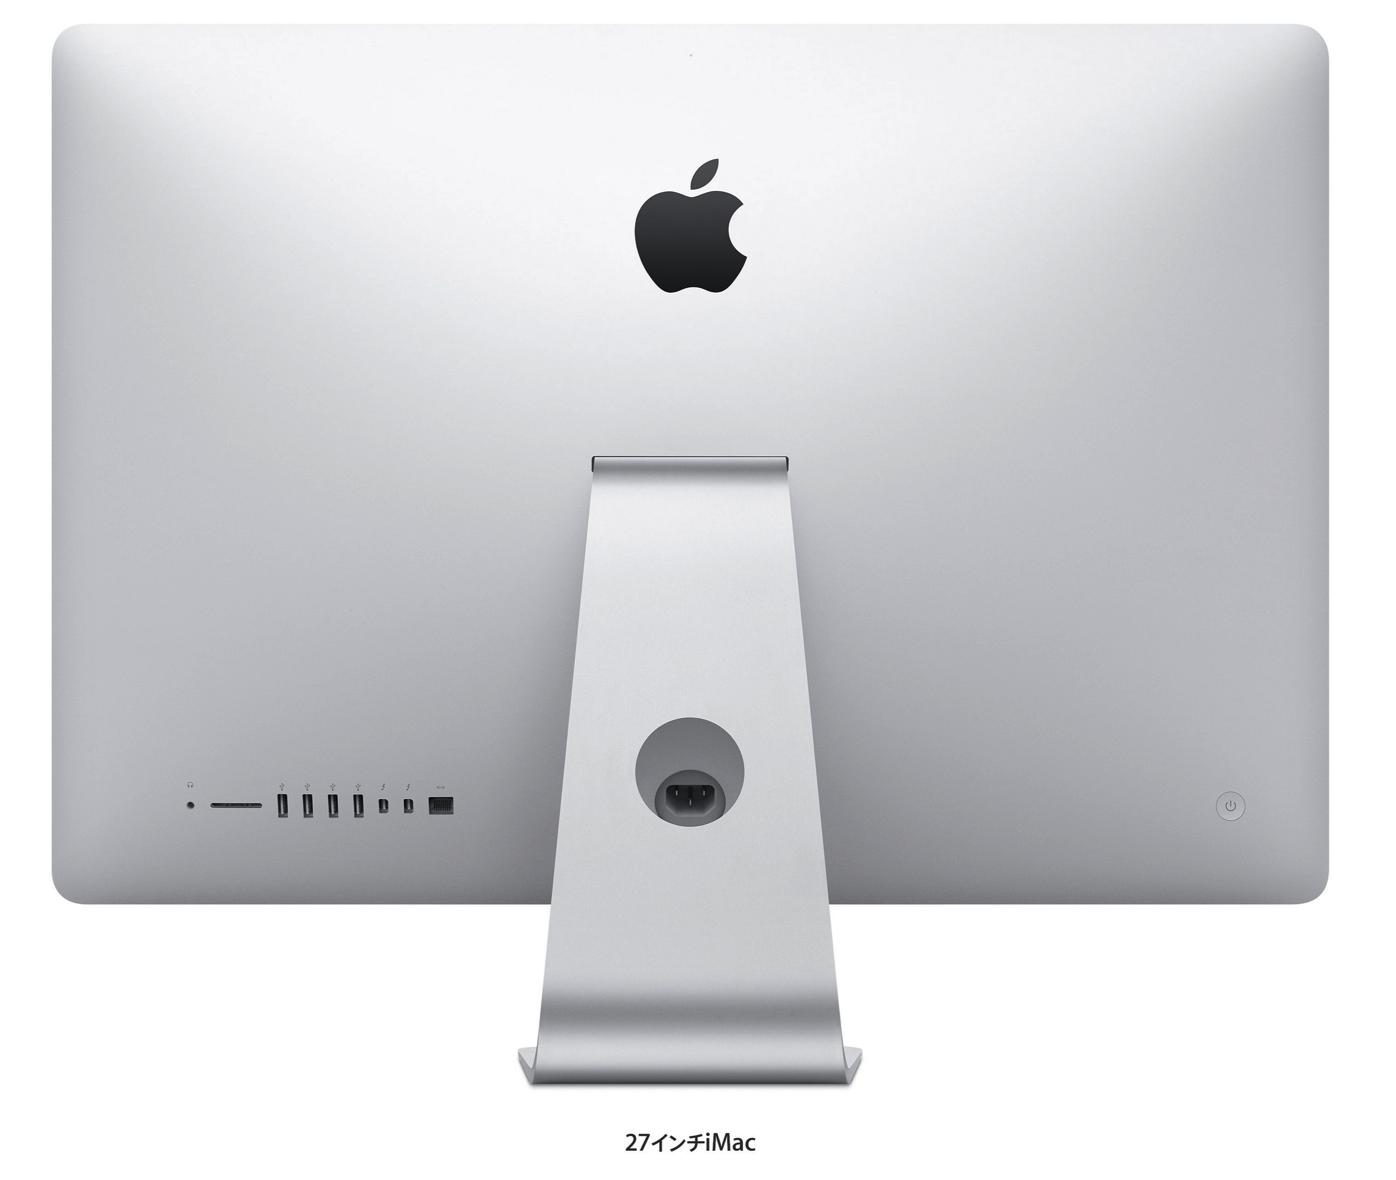 iMac 5K Retinaディスプレイモデル